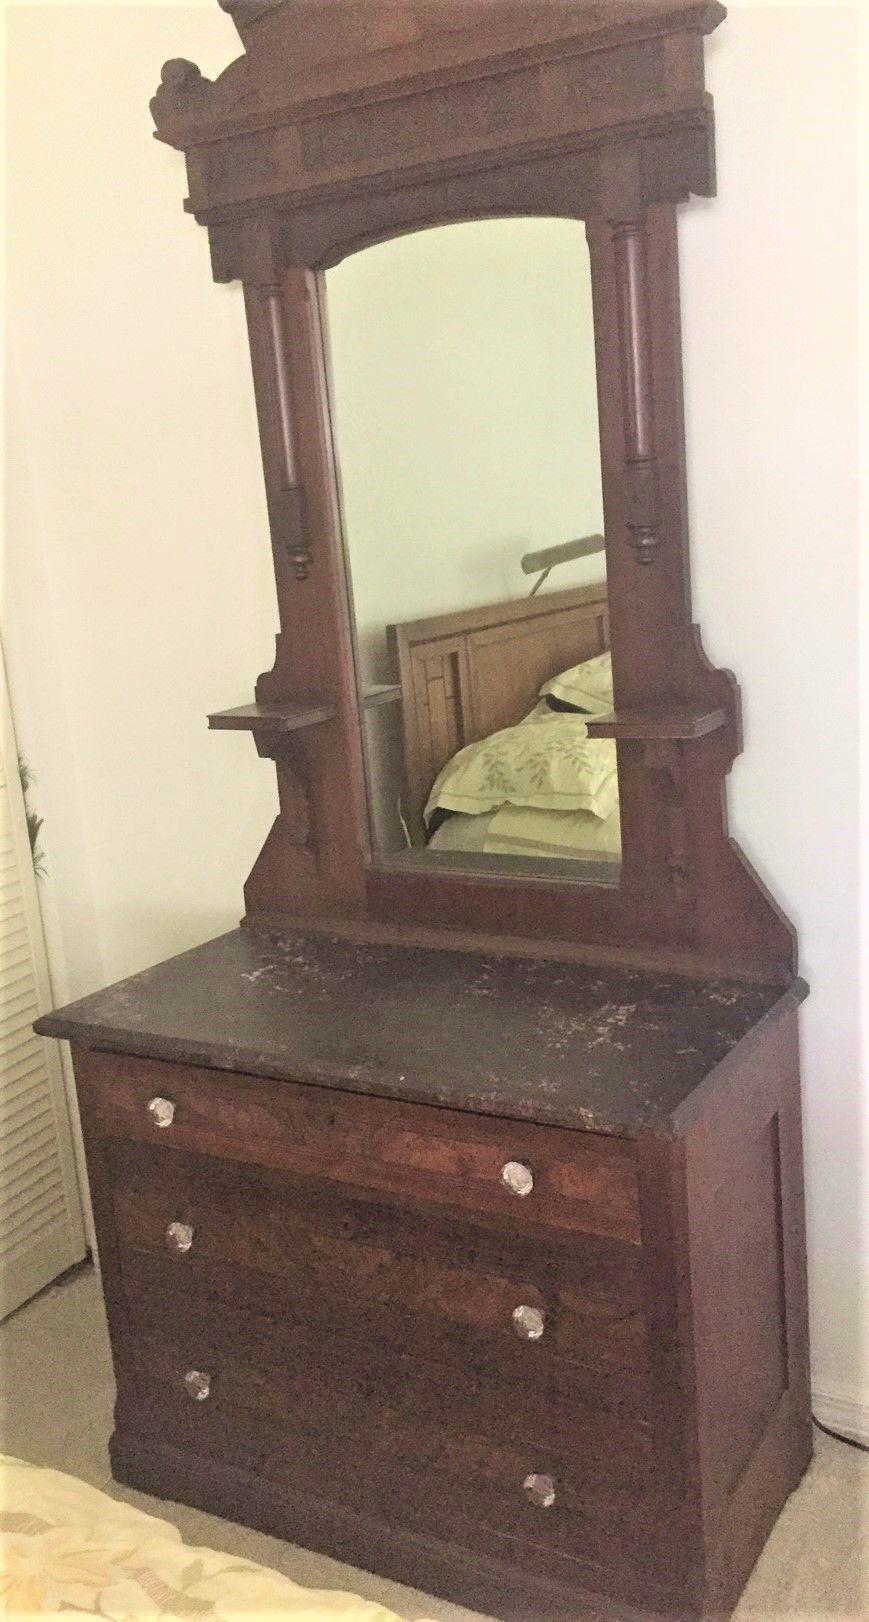 0614 mirror chest may 2020 (3).JPG